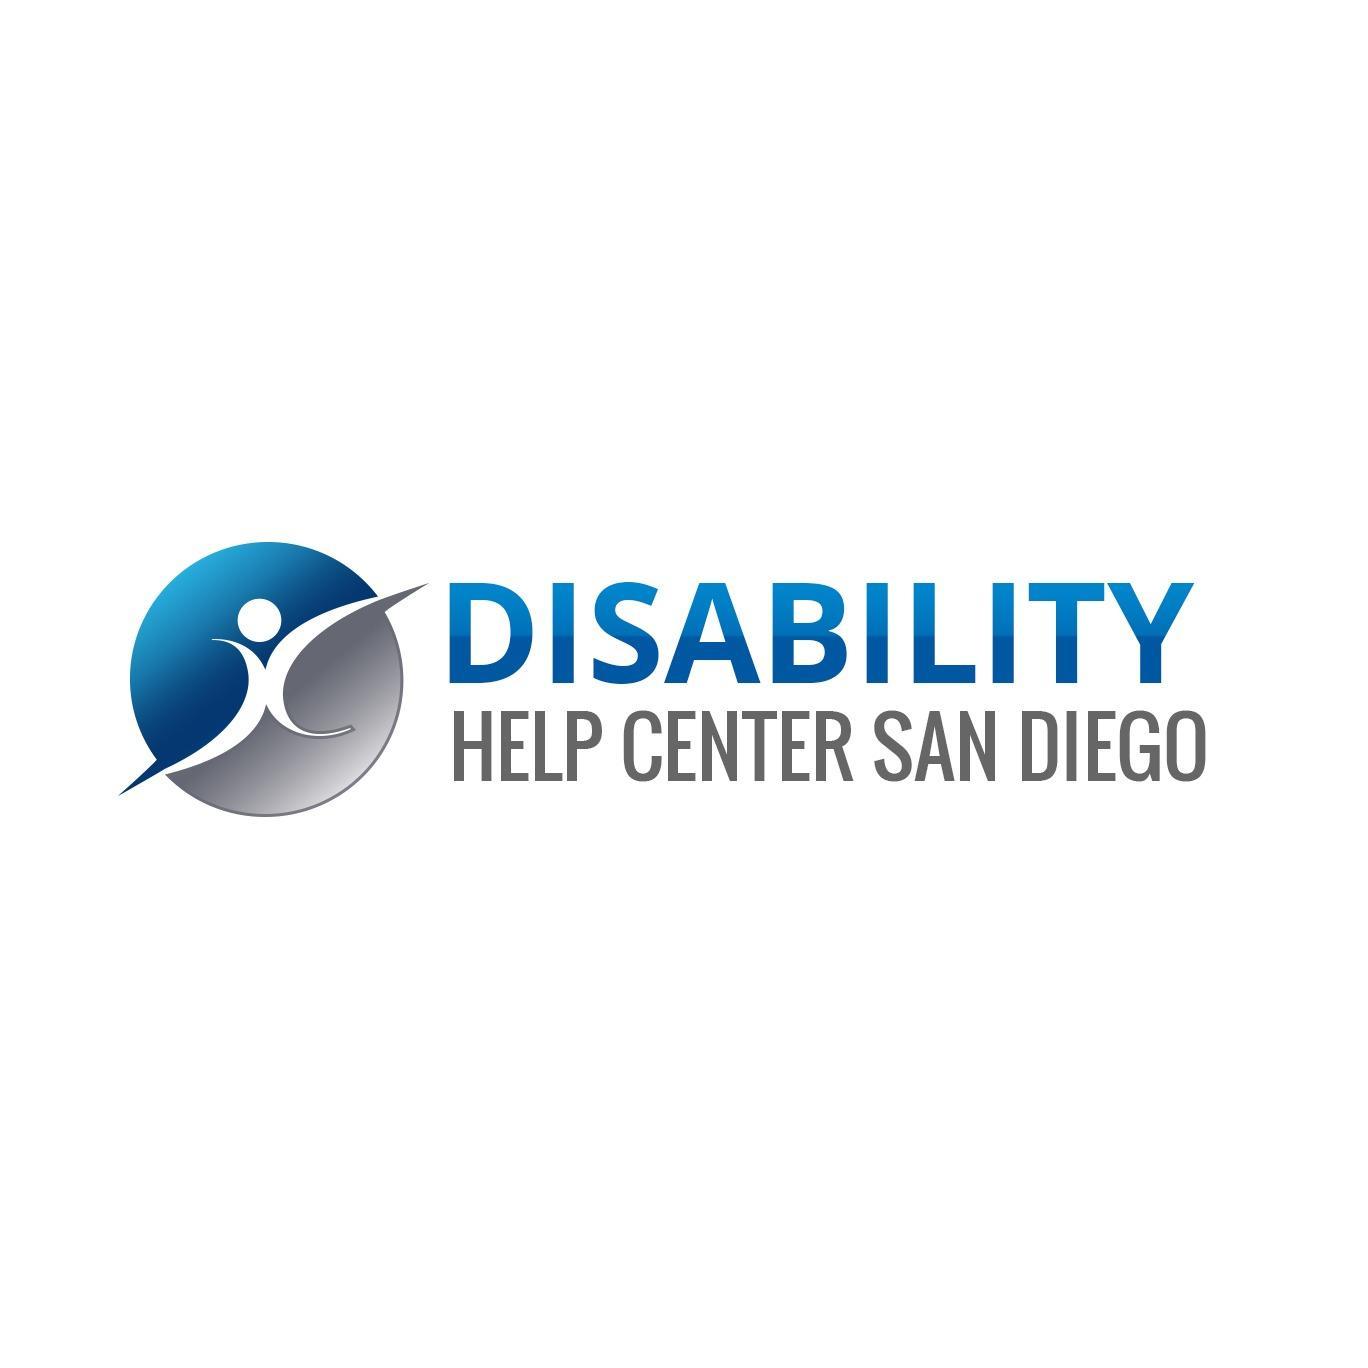 Disability Help Center